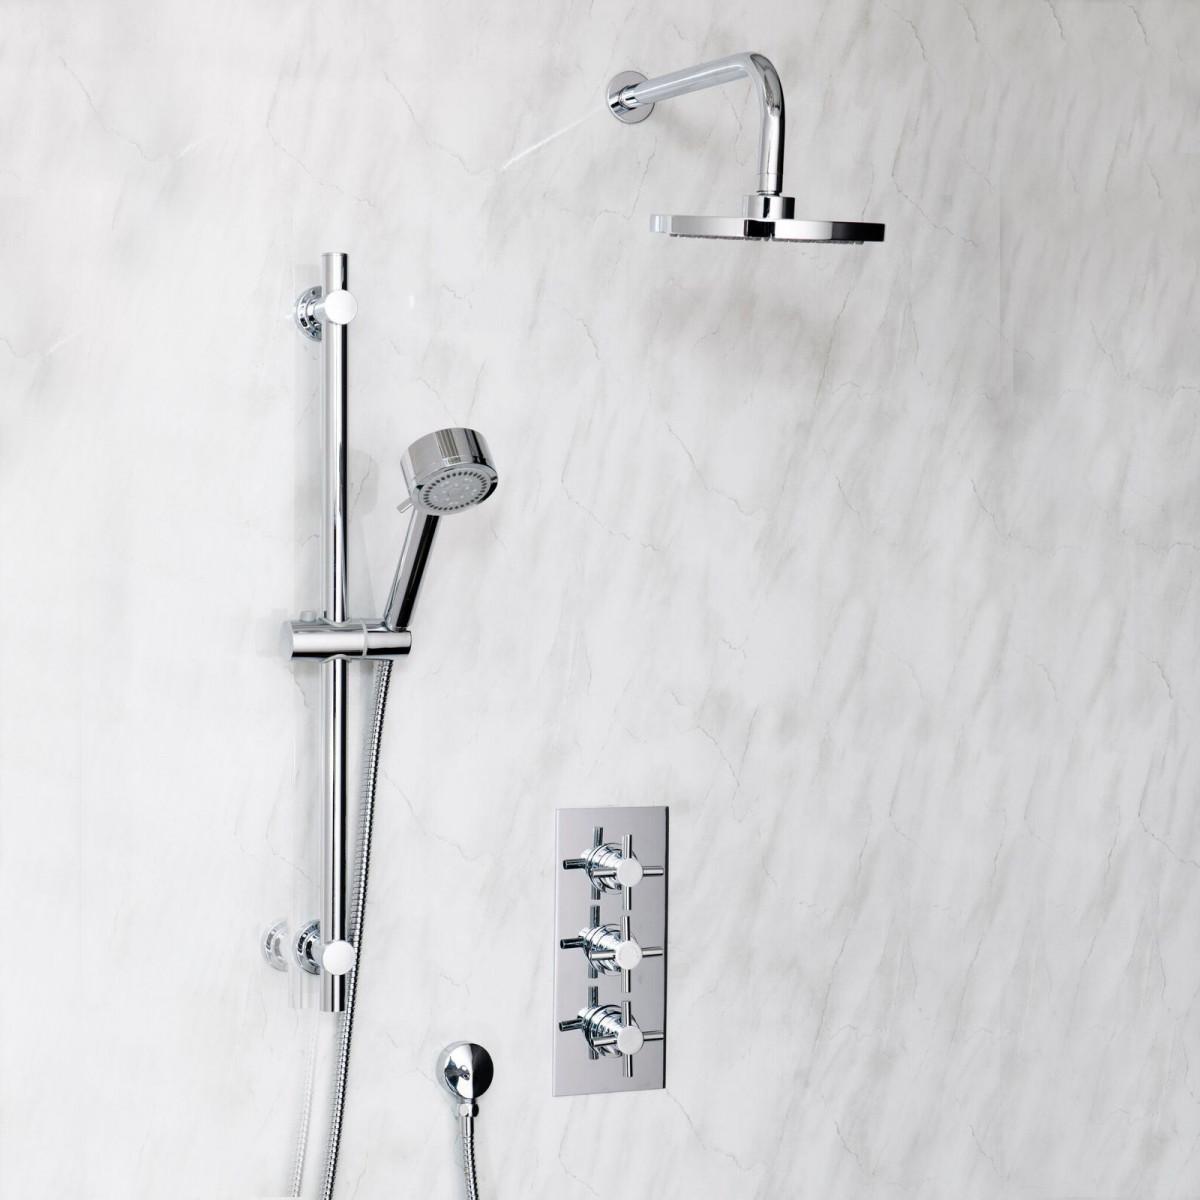 Cassellie Reno Triple Crosshead Concealed Shower Valve   CVT003 -